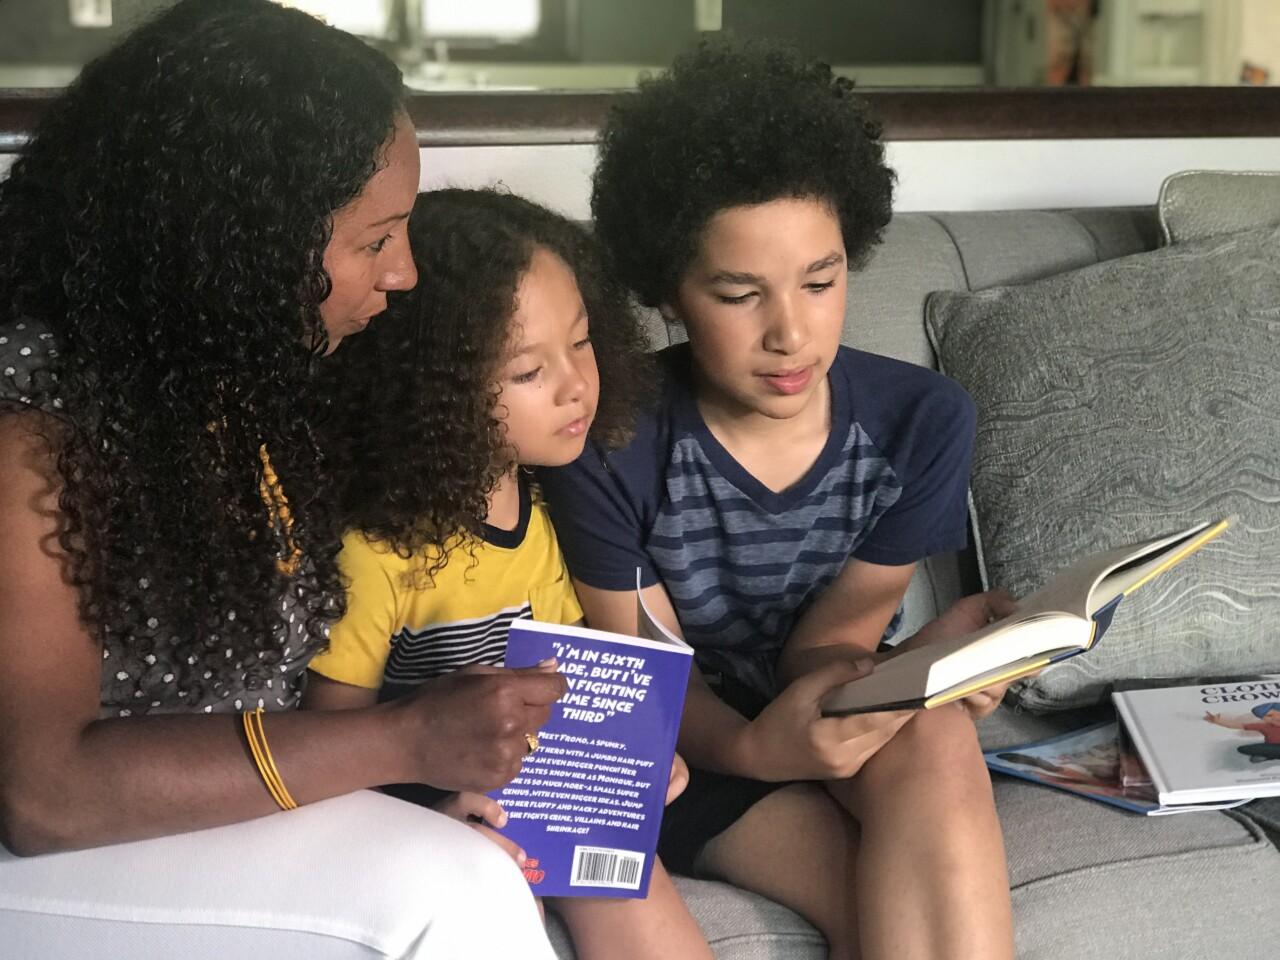 Deanna, Zion and Zephaniah reading